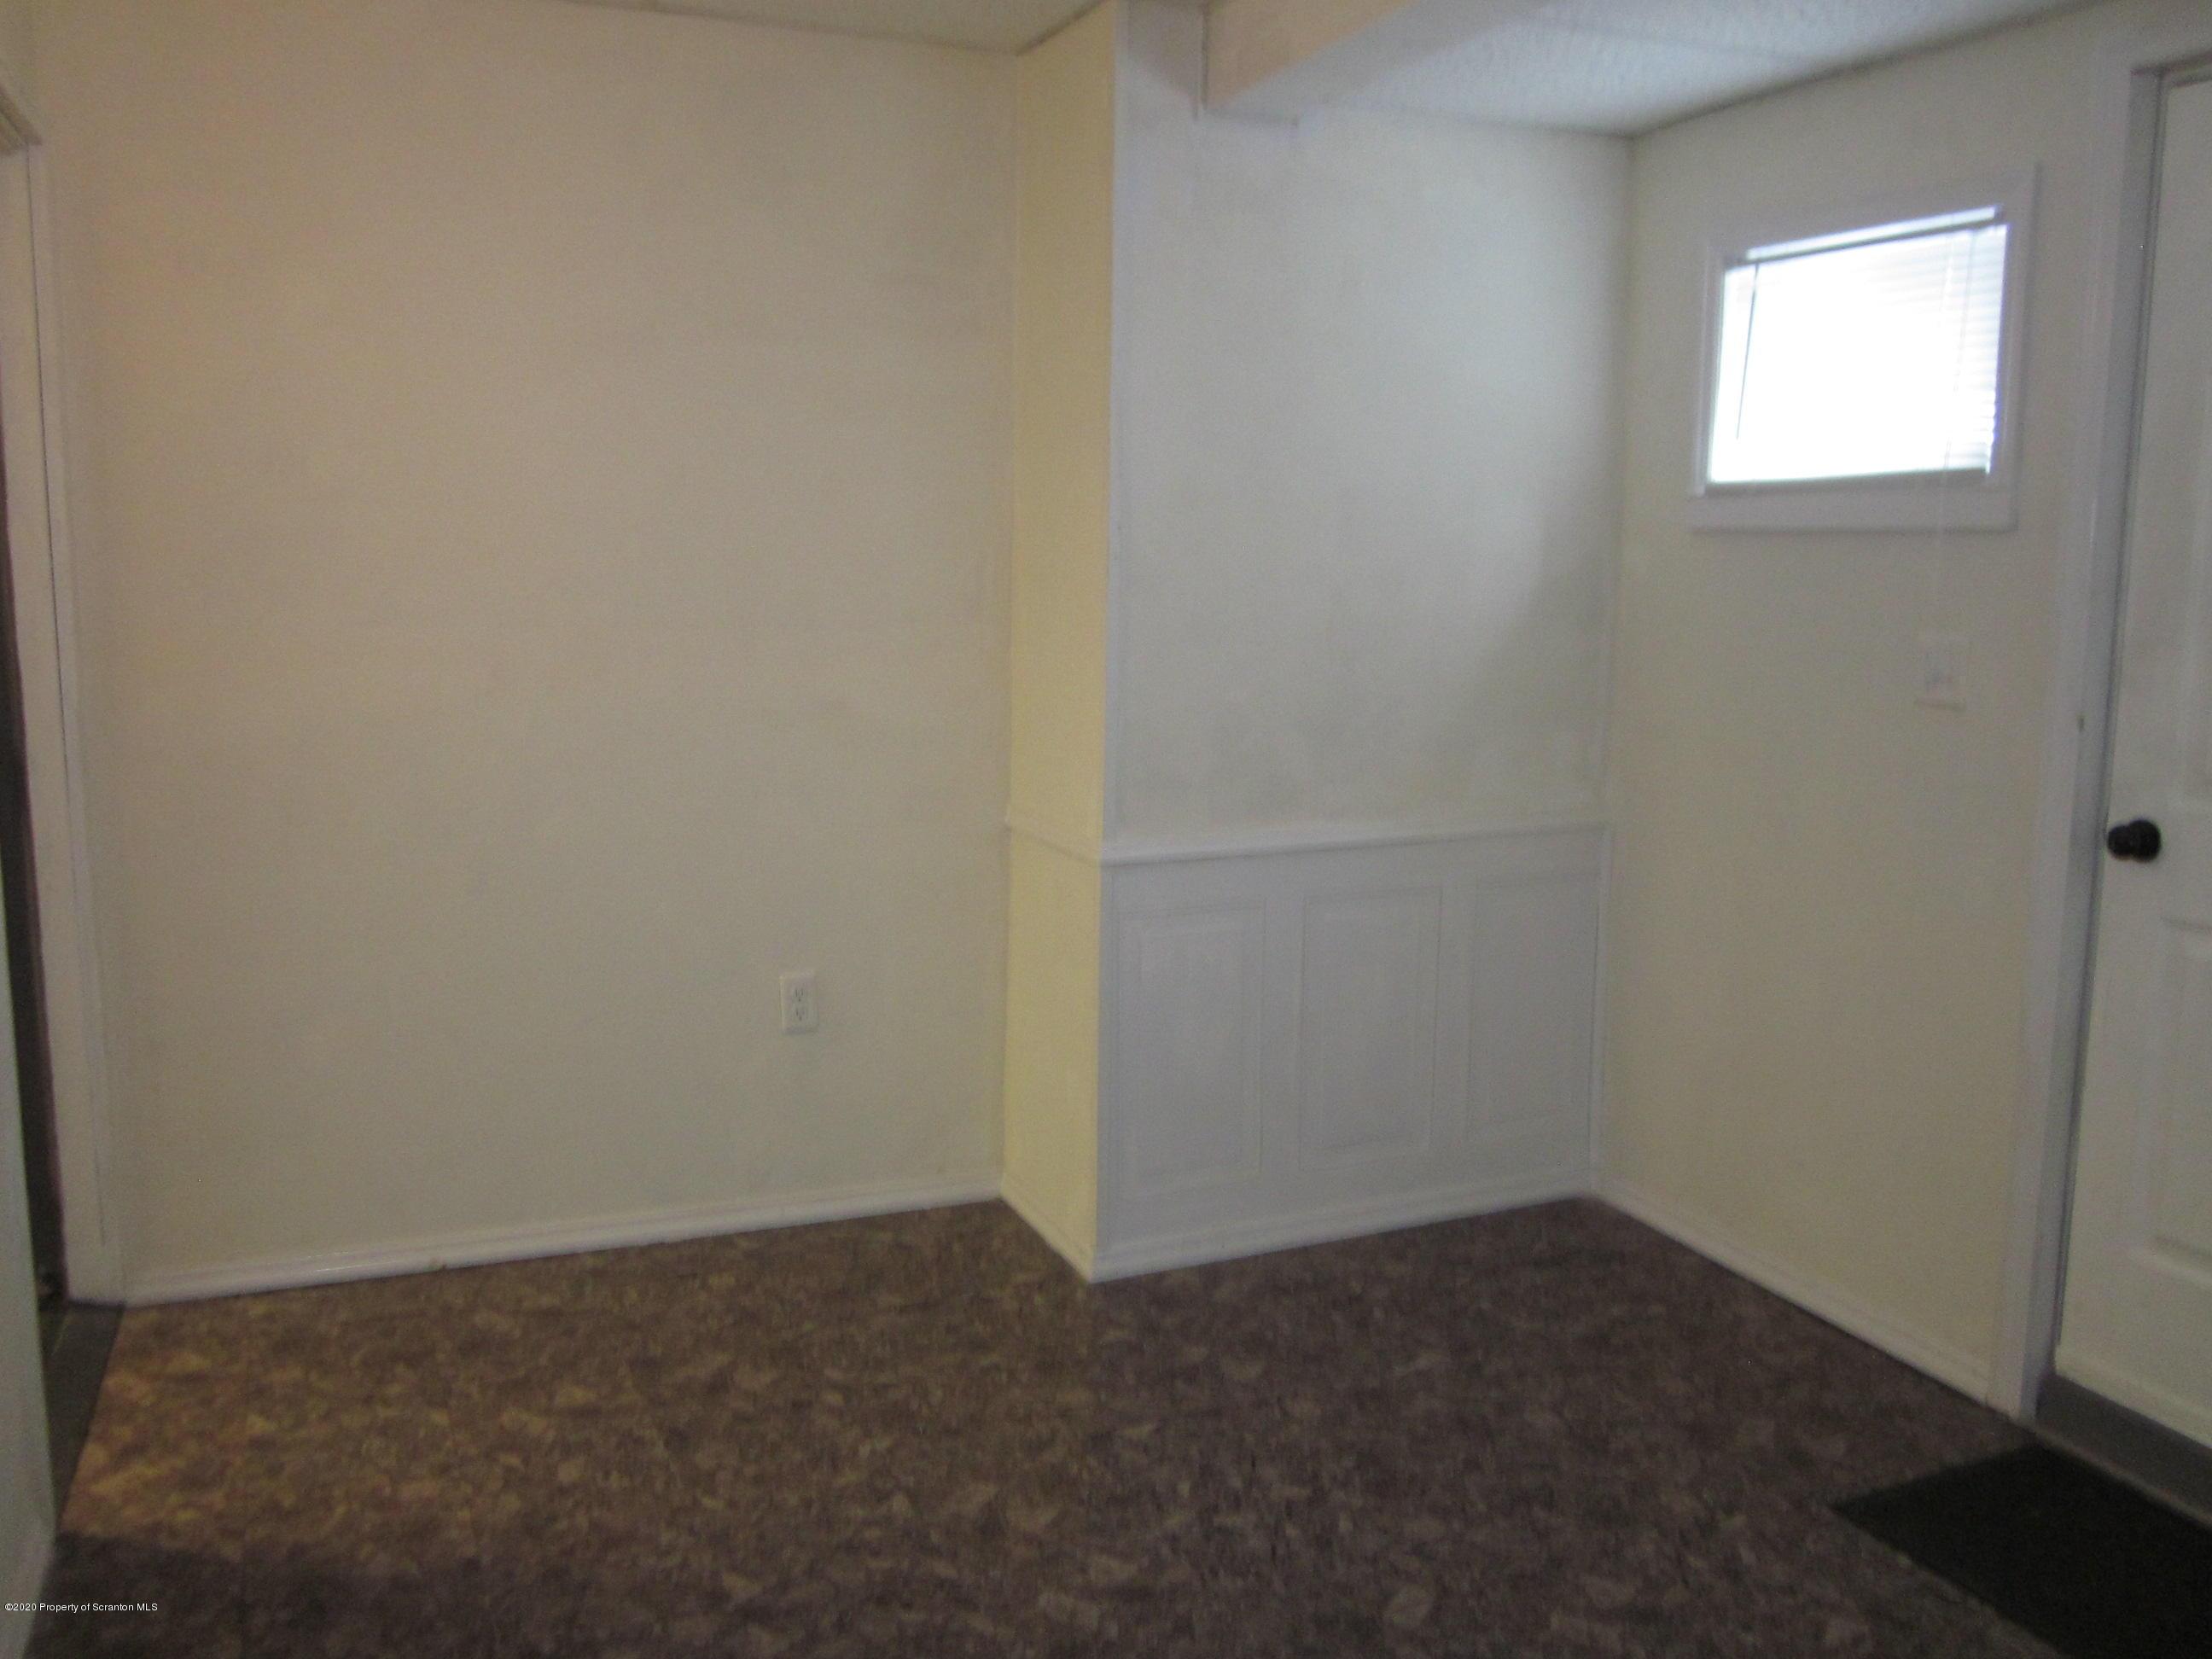 503 Main, Scranton, Pennsylvania 18504, ,2 BathroomsBathrooms,Commercial,For Sale,Main,20-671